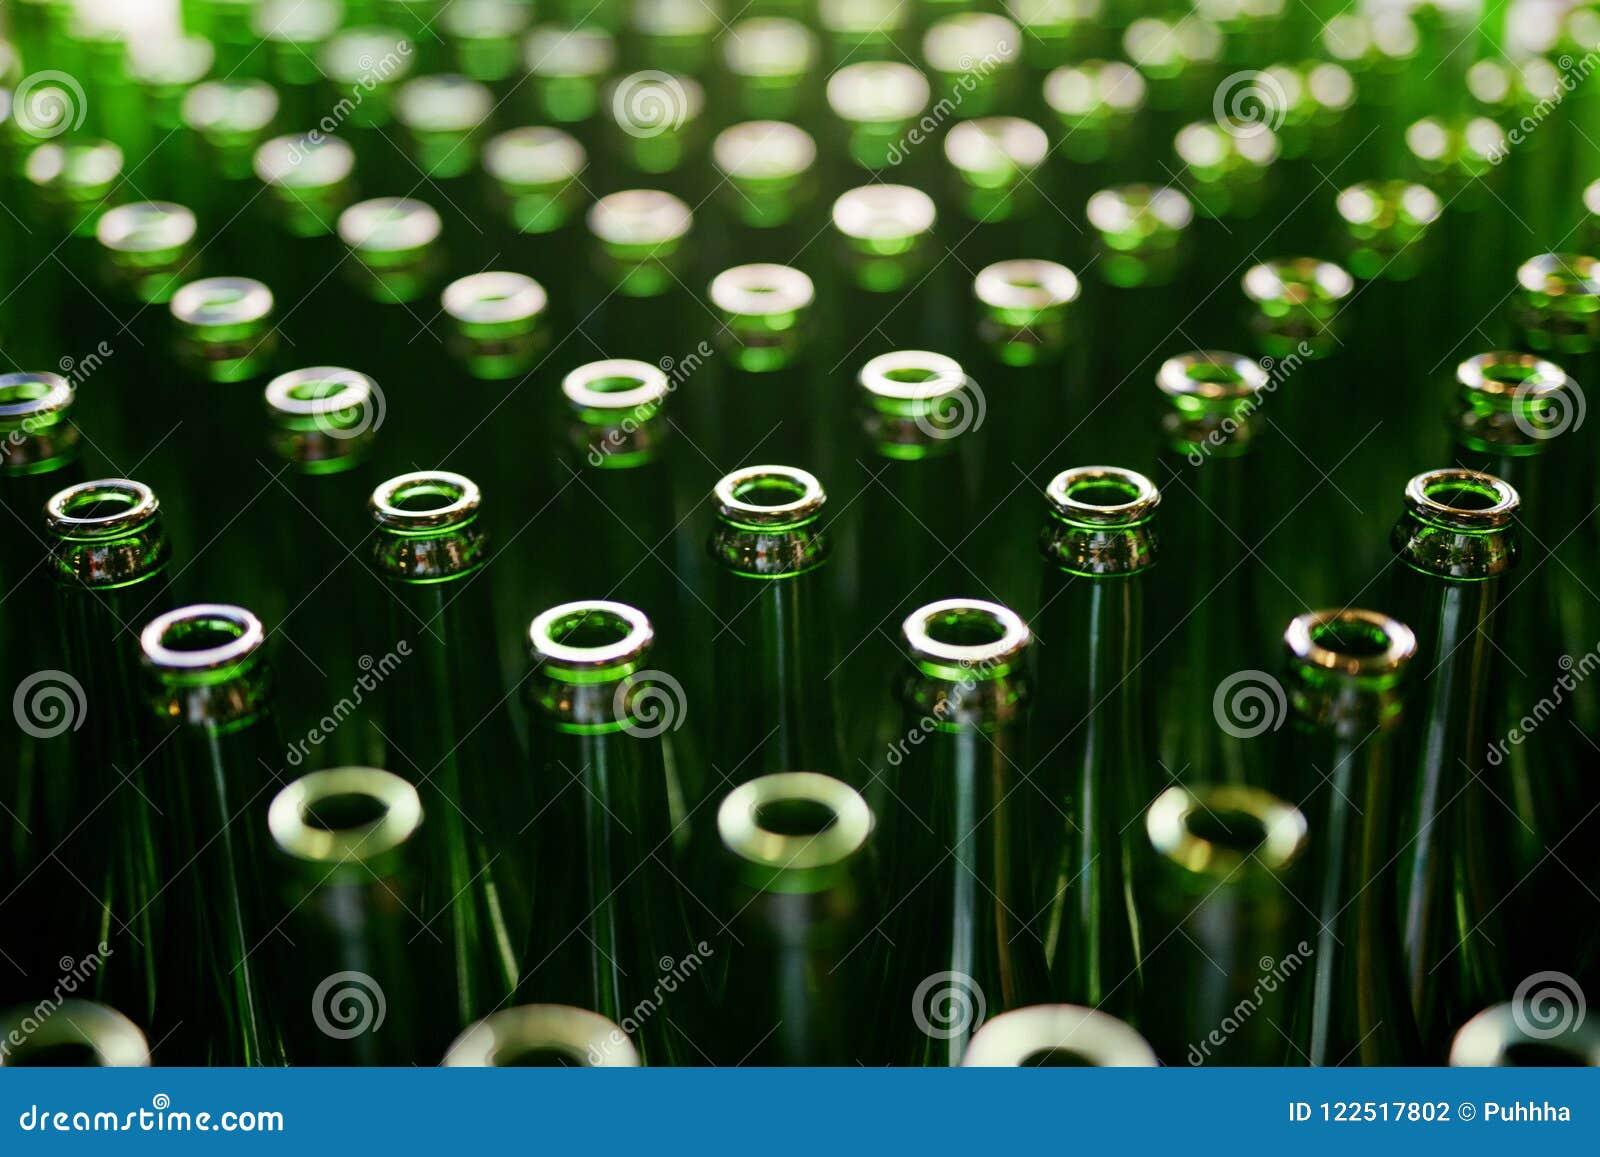 Brewery Bottiglie di birra sulla fabbricazione